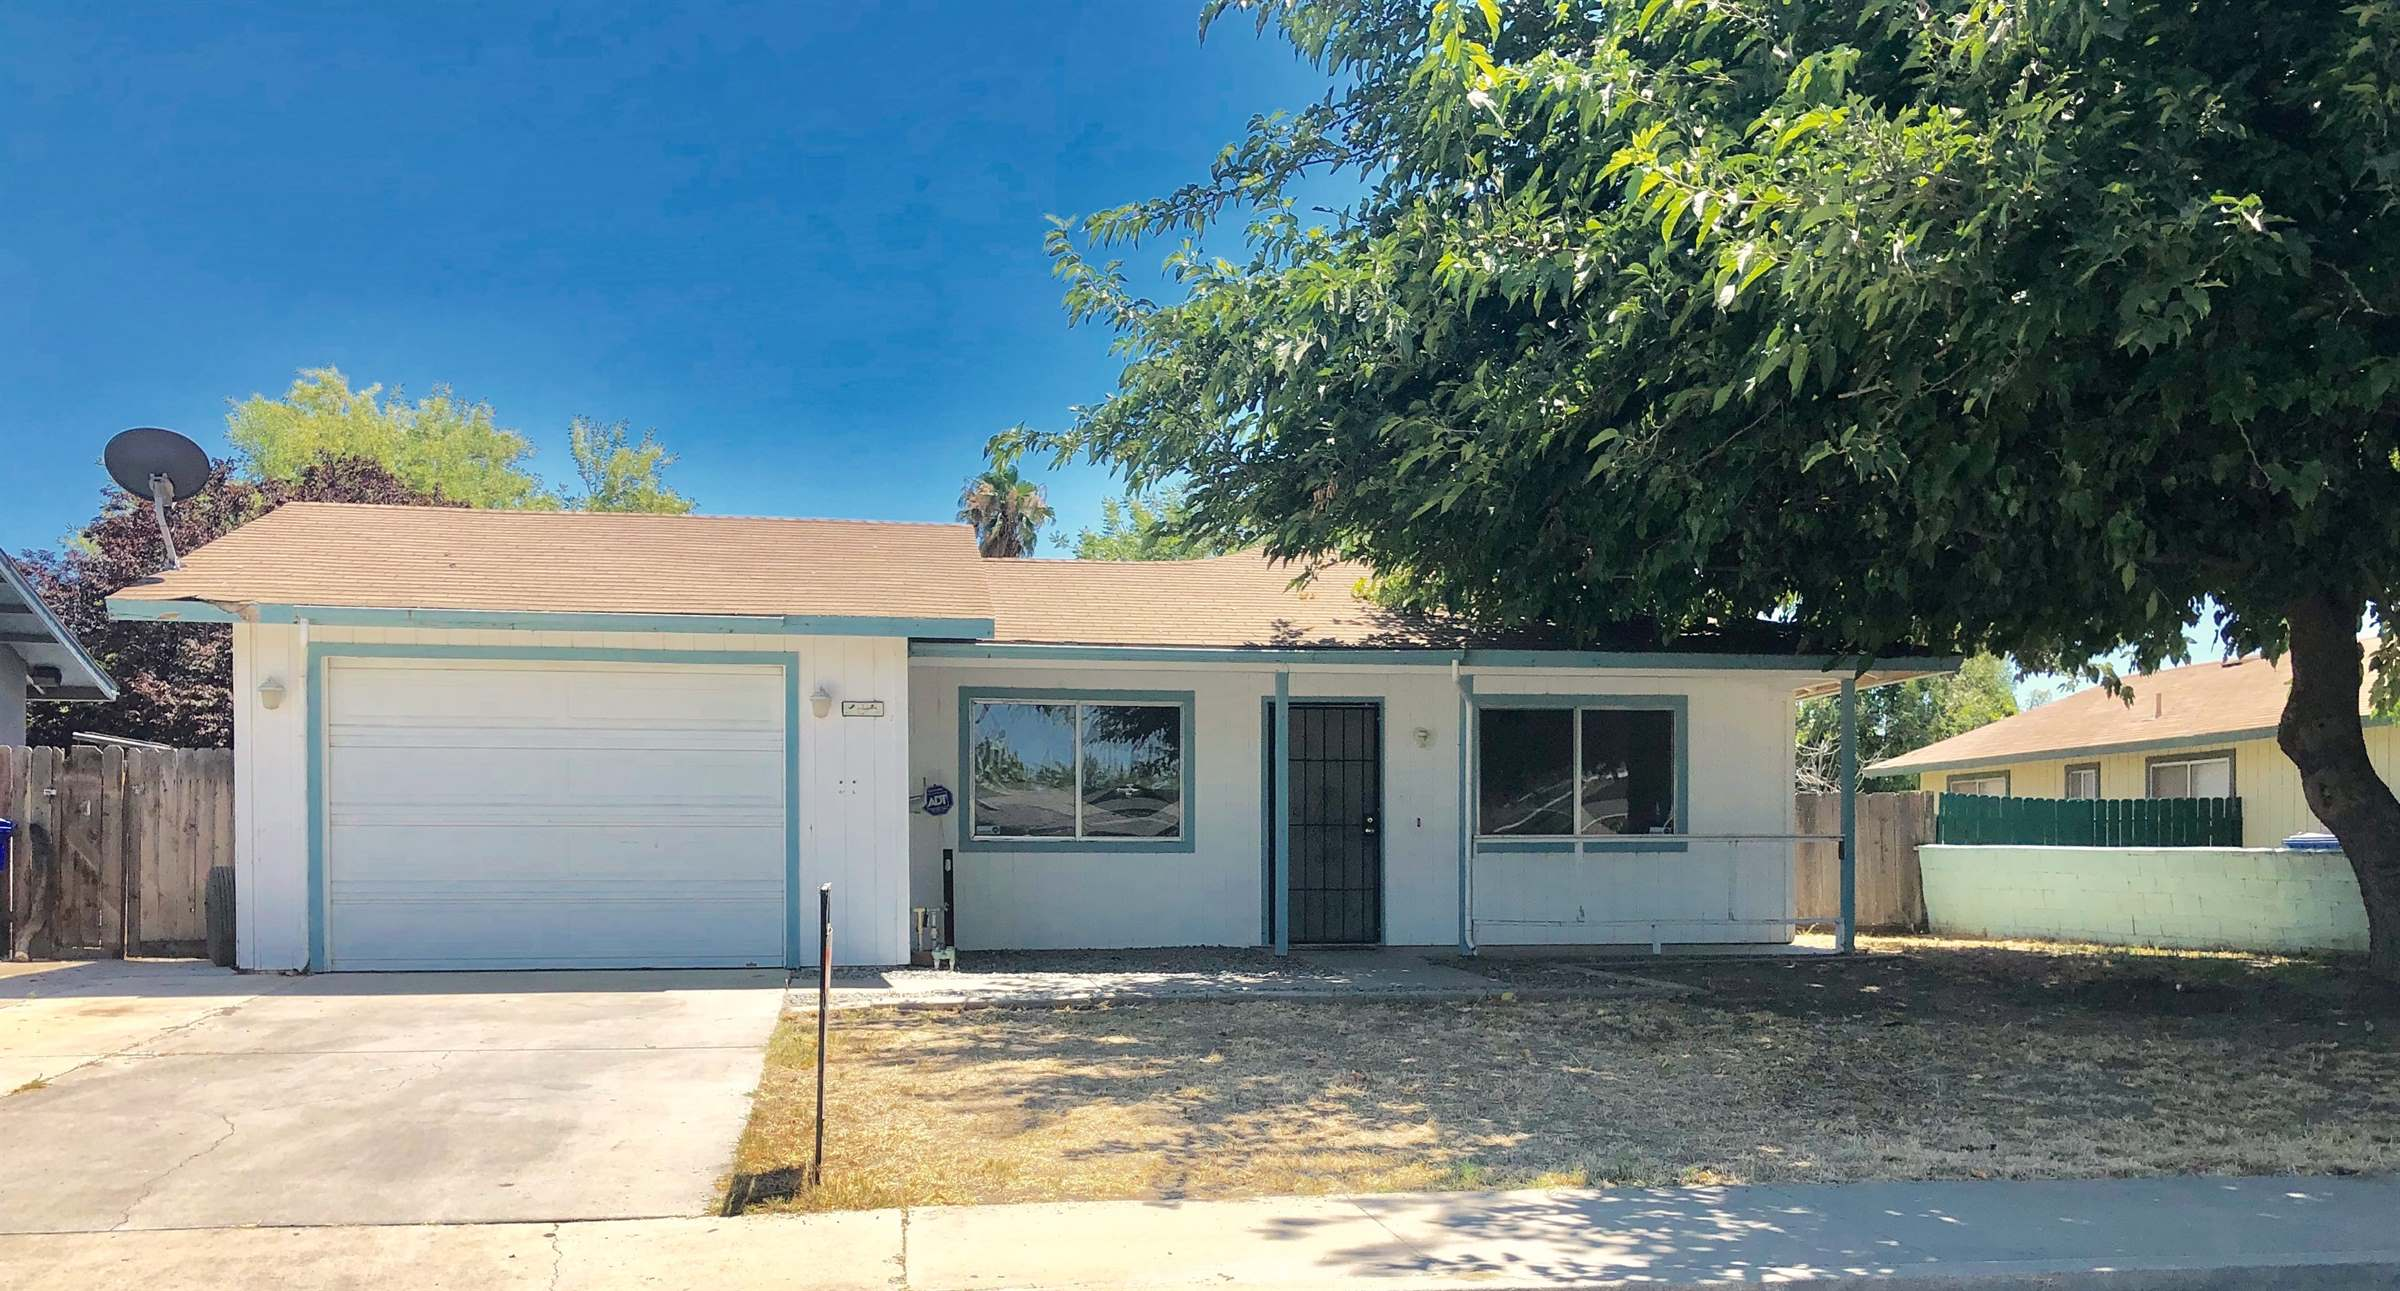 1165 Ventura Ave Corcoran, CA 93212